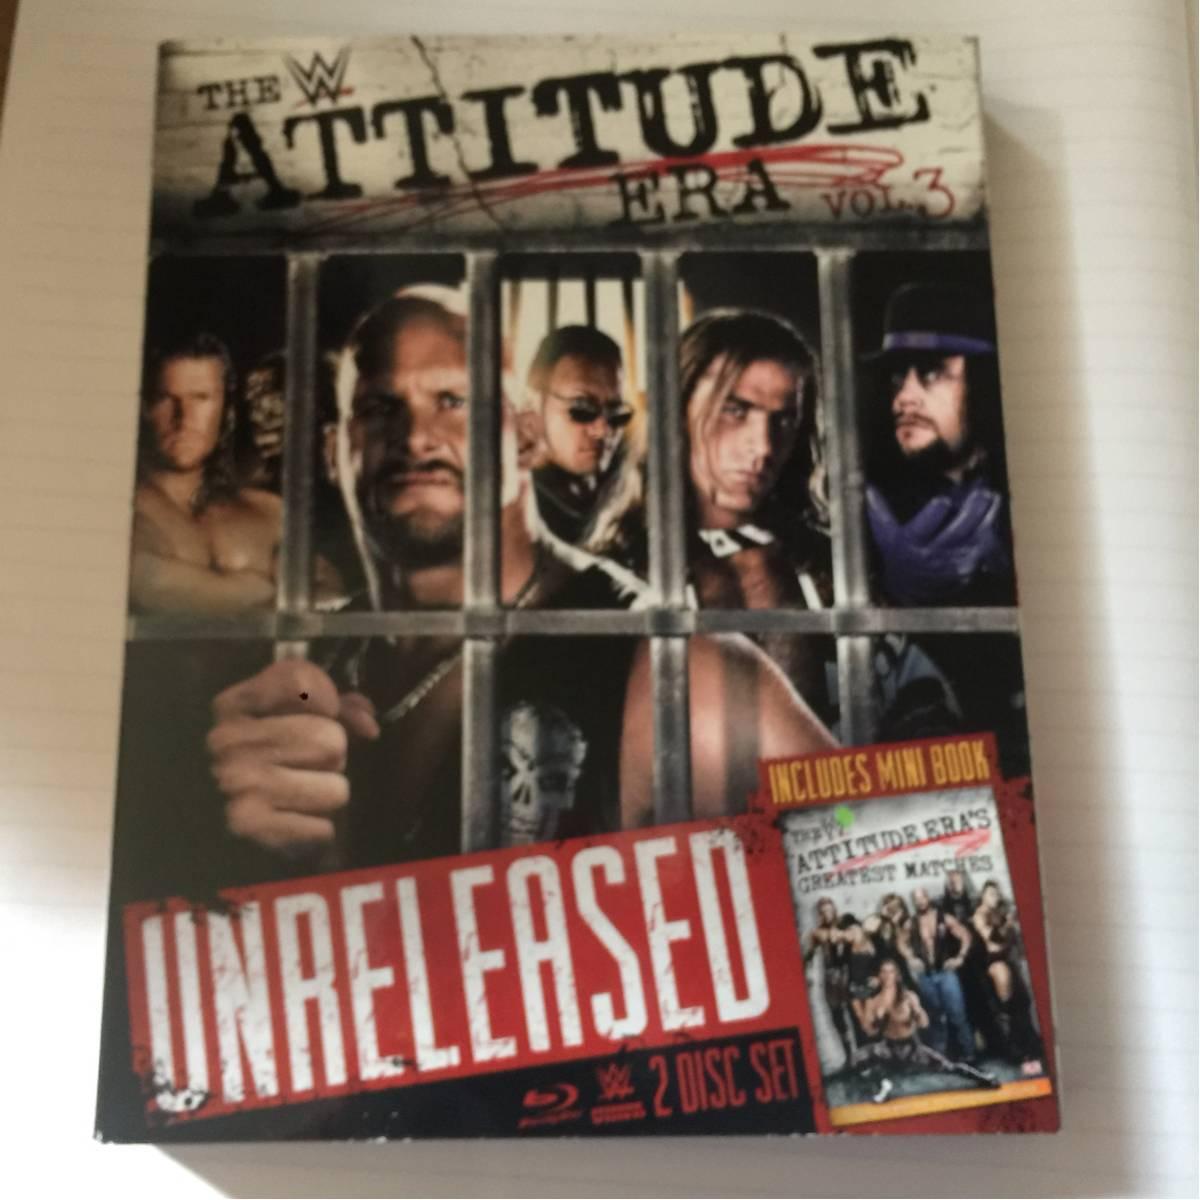 WWE Blu-ray attitude era 送料無料 日本ブルーレイ機器で再生可能 プロレス ブックレット付き グッズの画像